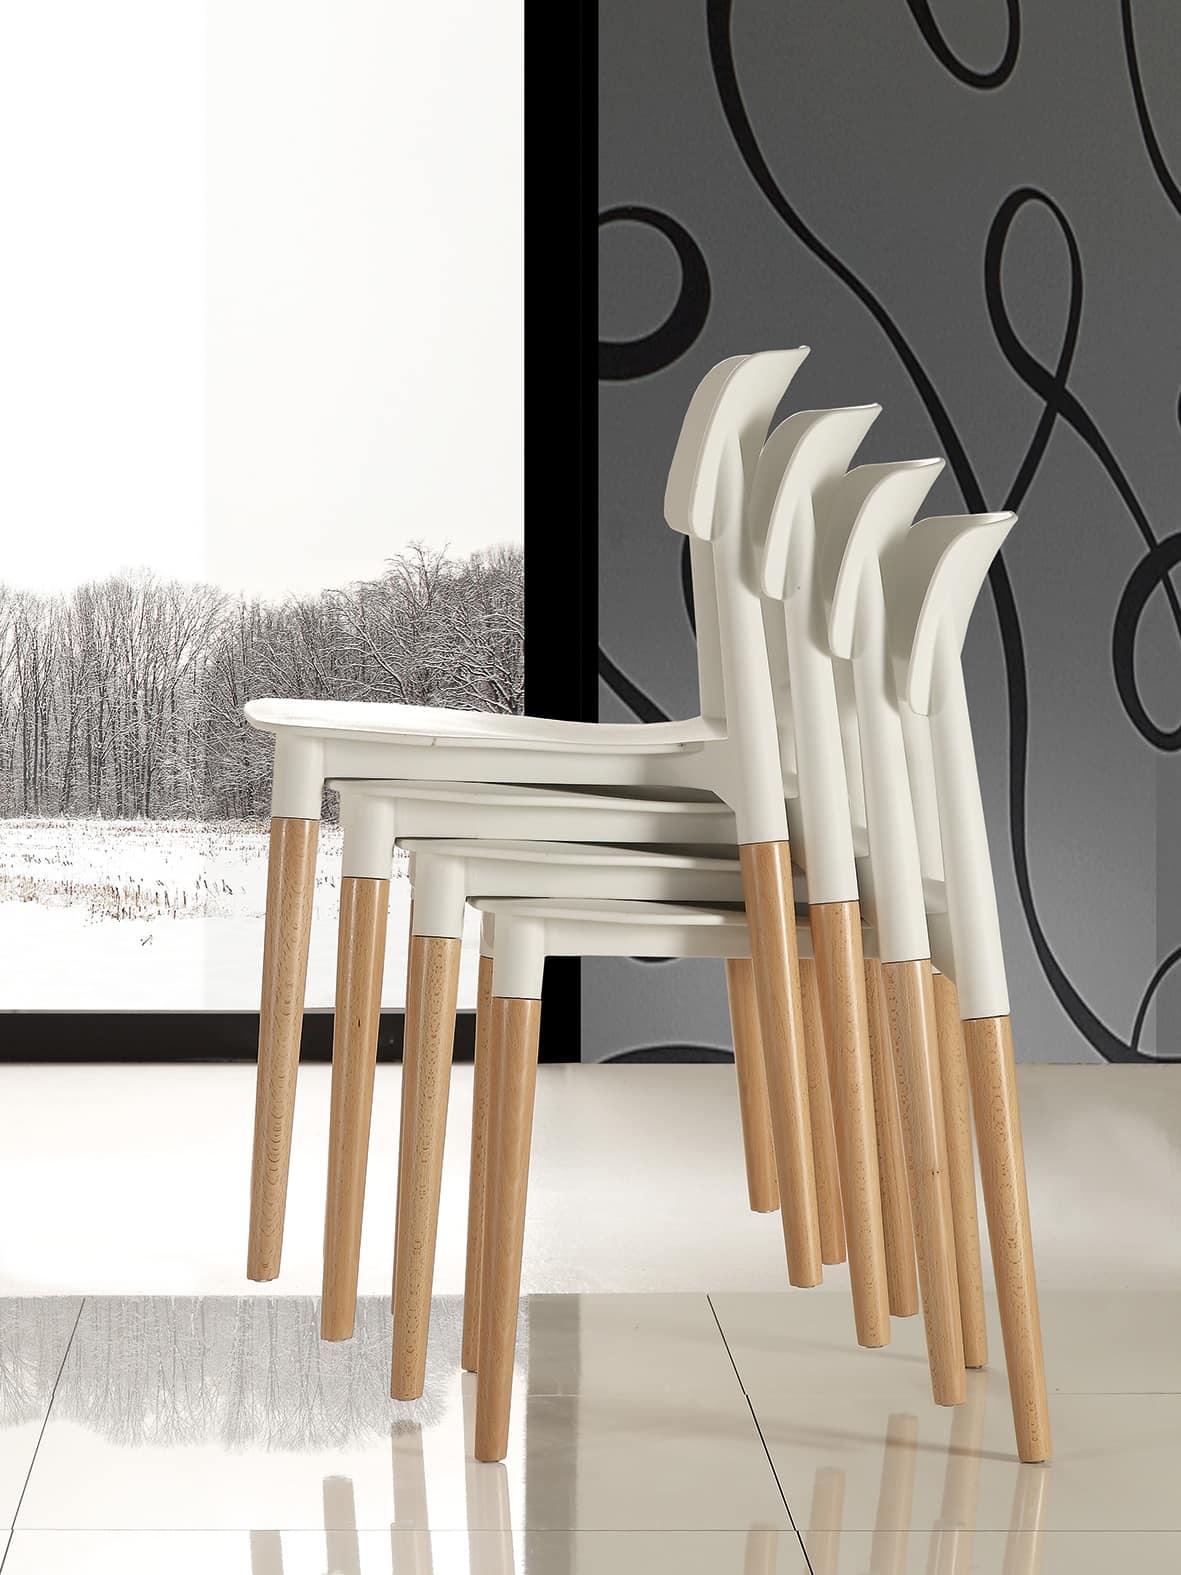 Art. 024 Artika, Space saving chair, comfortable and stackable